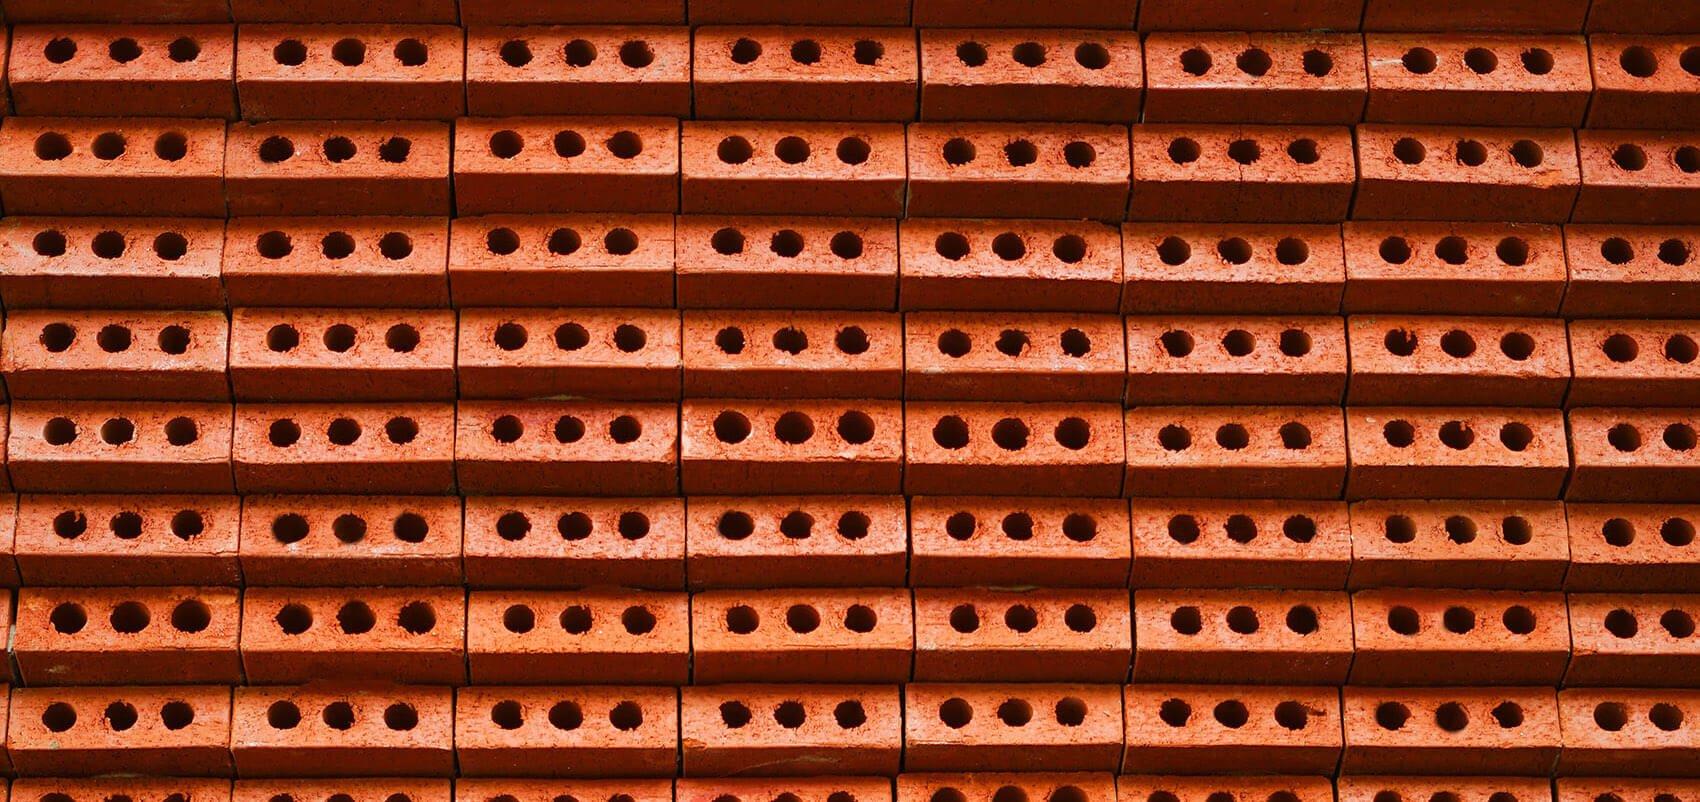 A close-up view of the bricks at JPG coffee & LAB burger